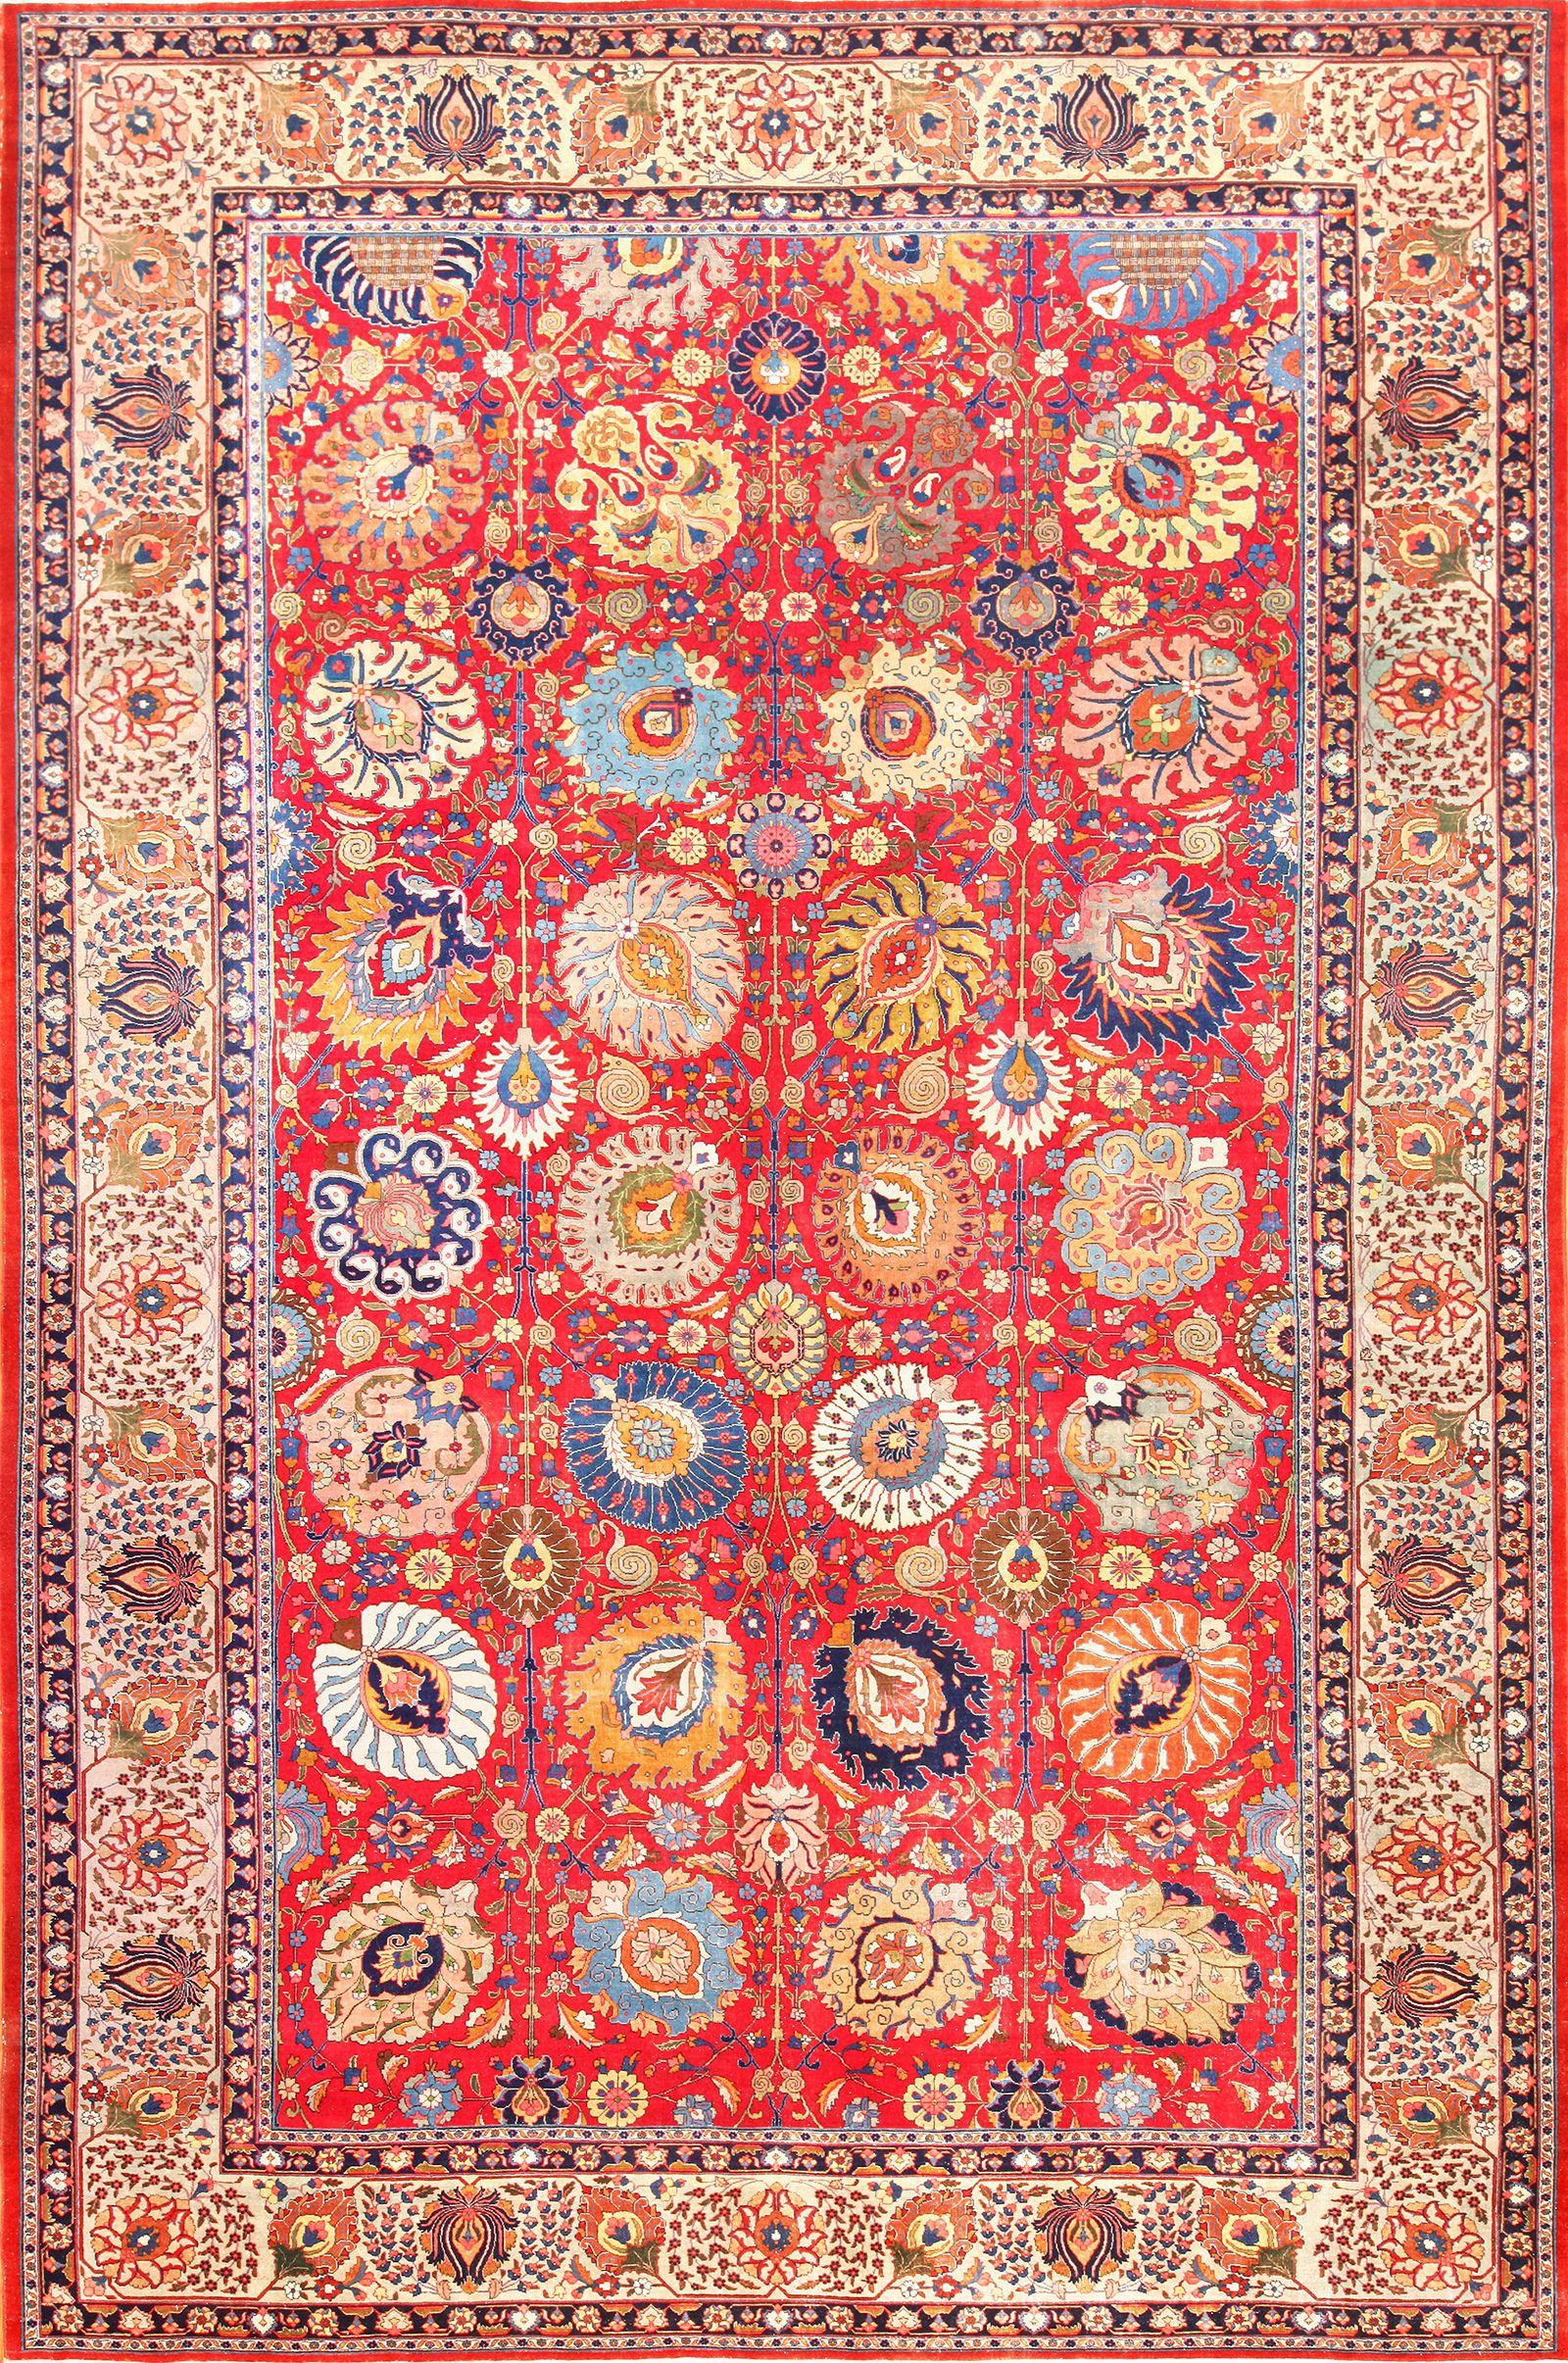 Large Red Persian Tabriz Rug by Nazmiyal